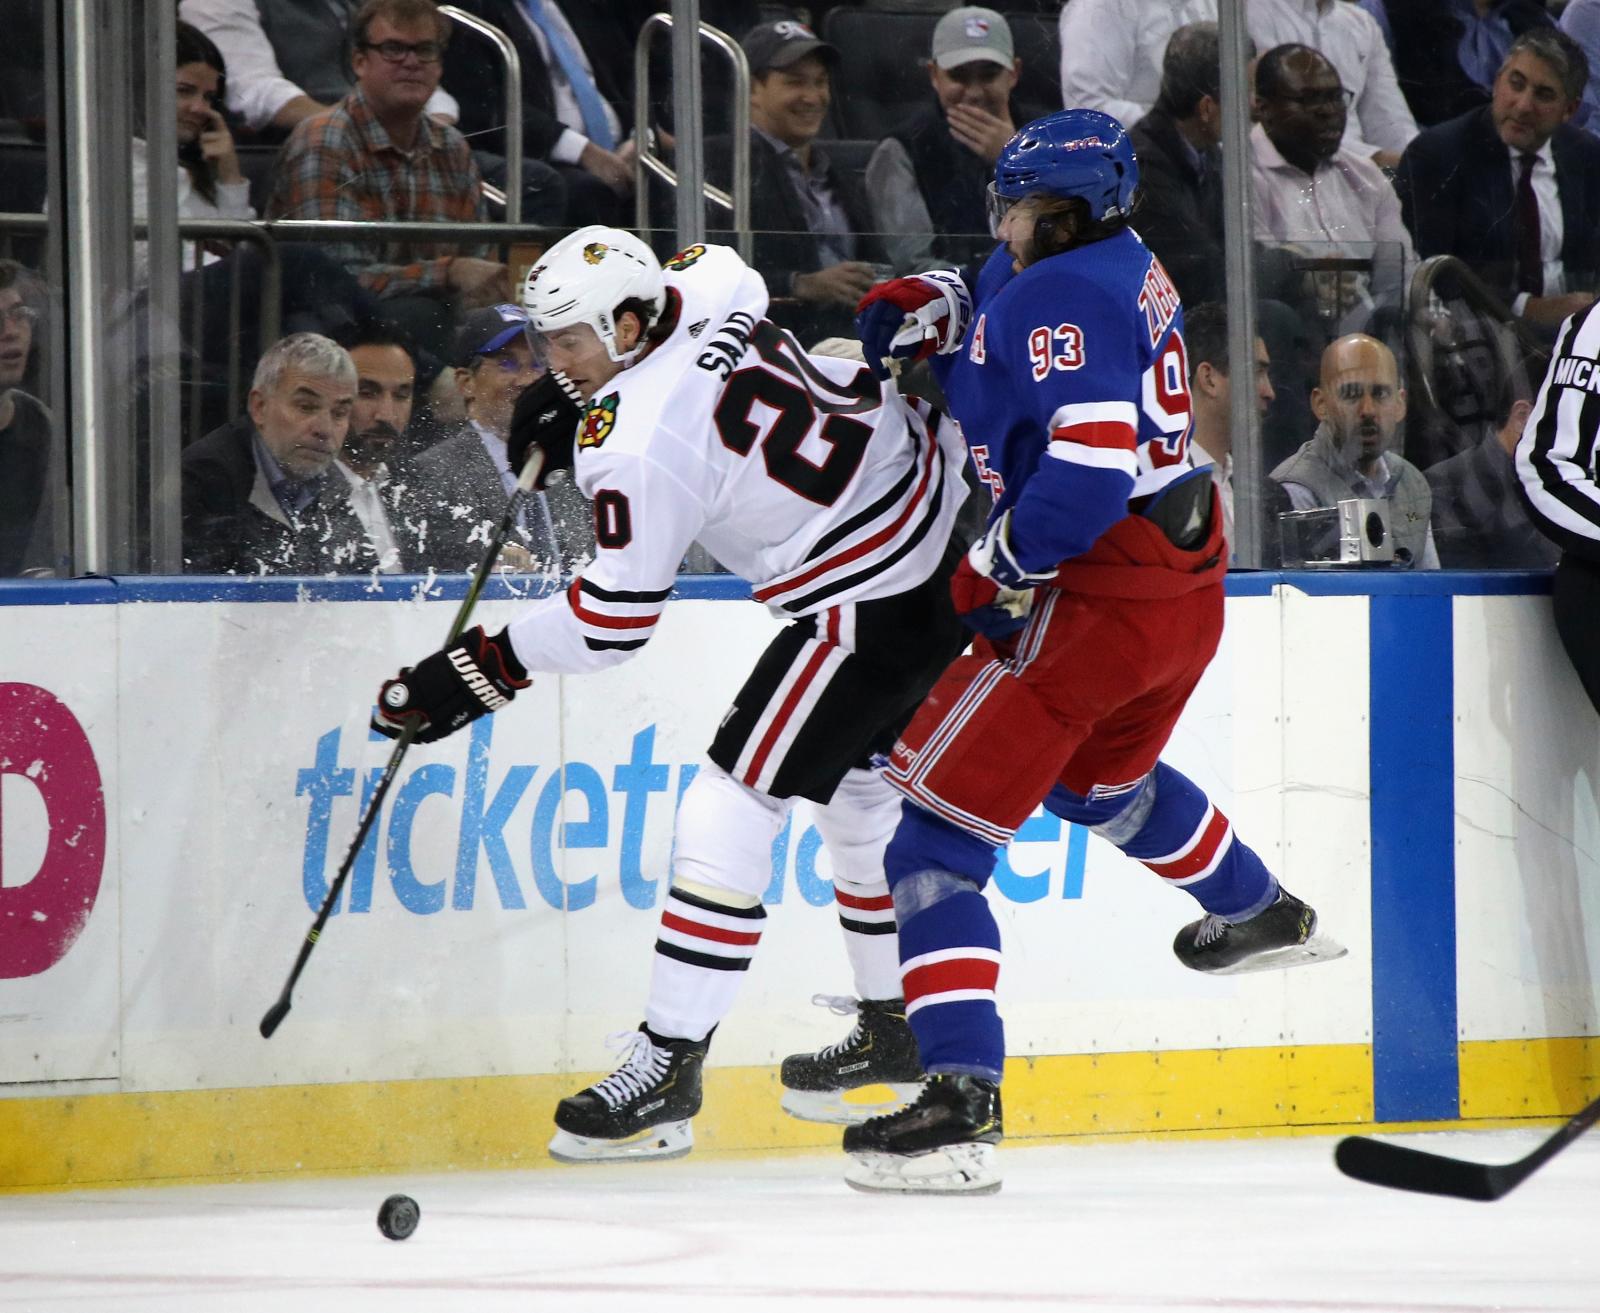 New York Rangers vs Blackhawks: A battle of playoff wannabes